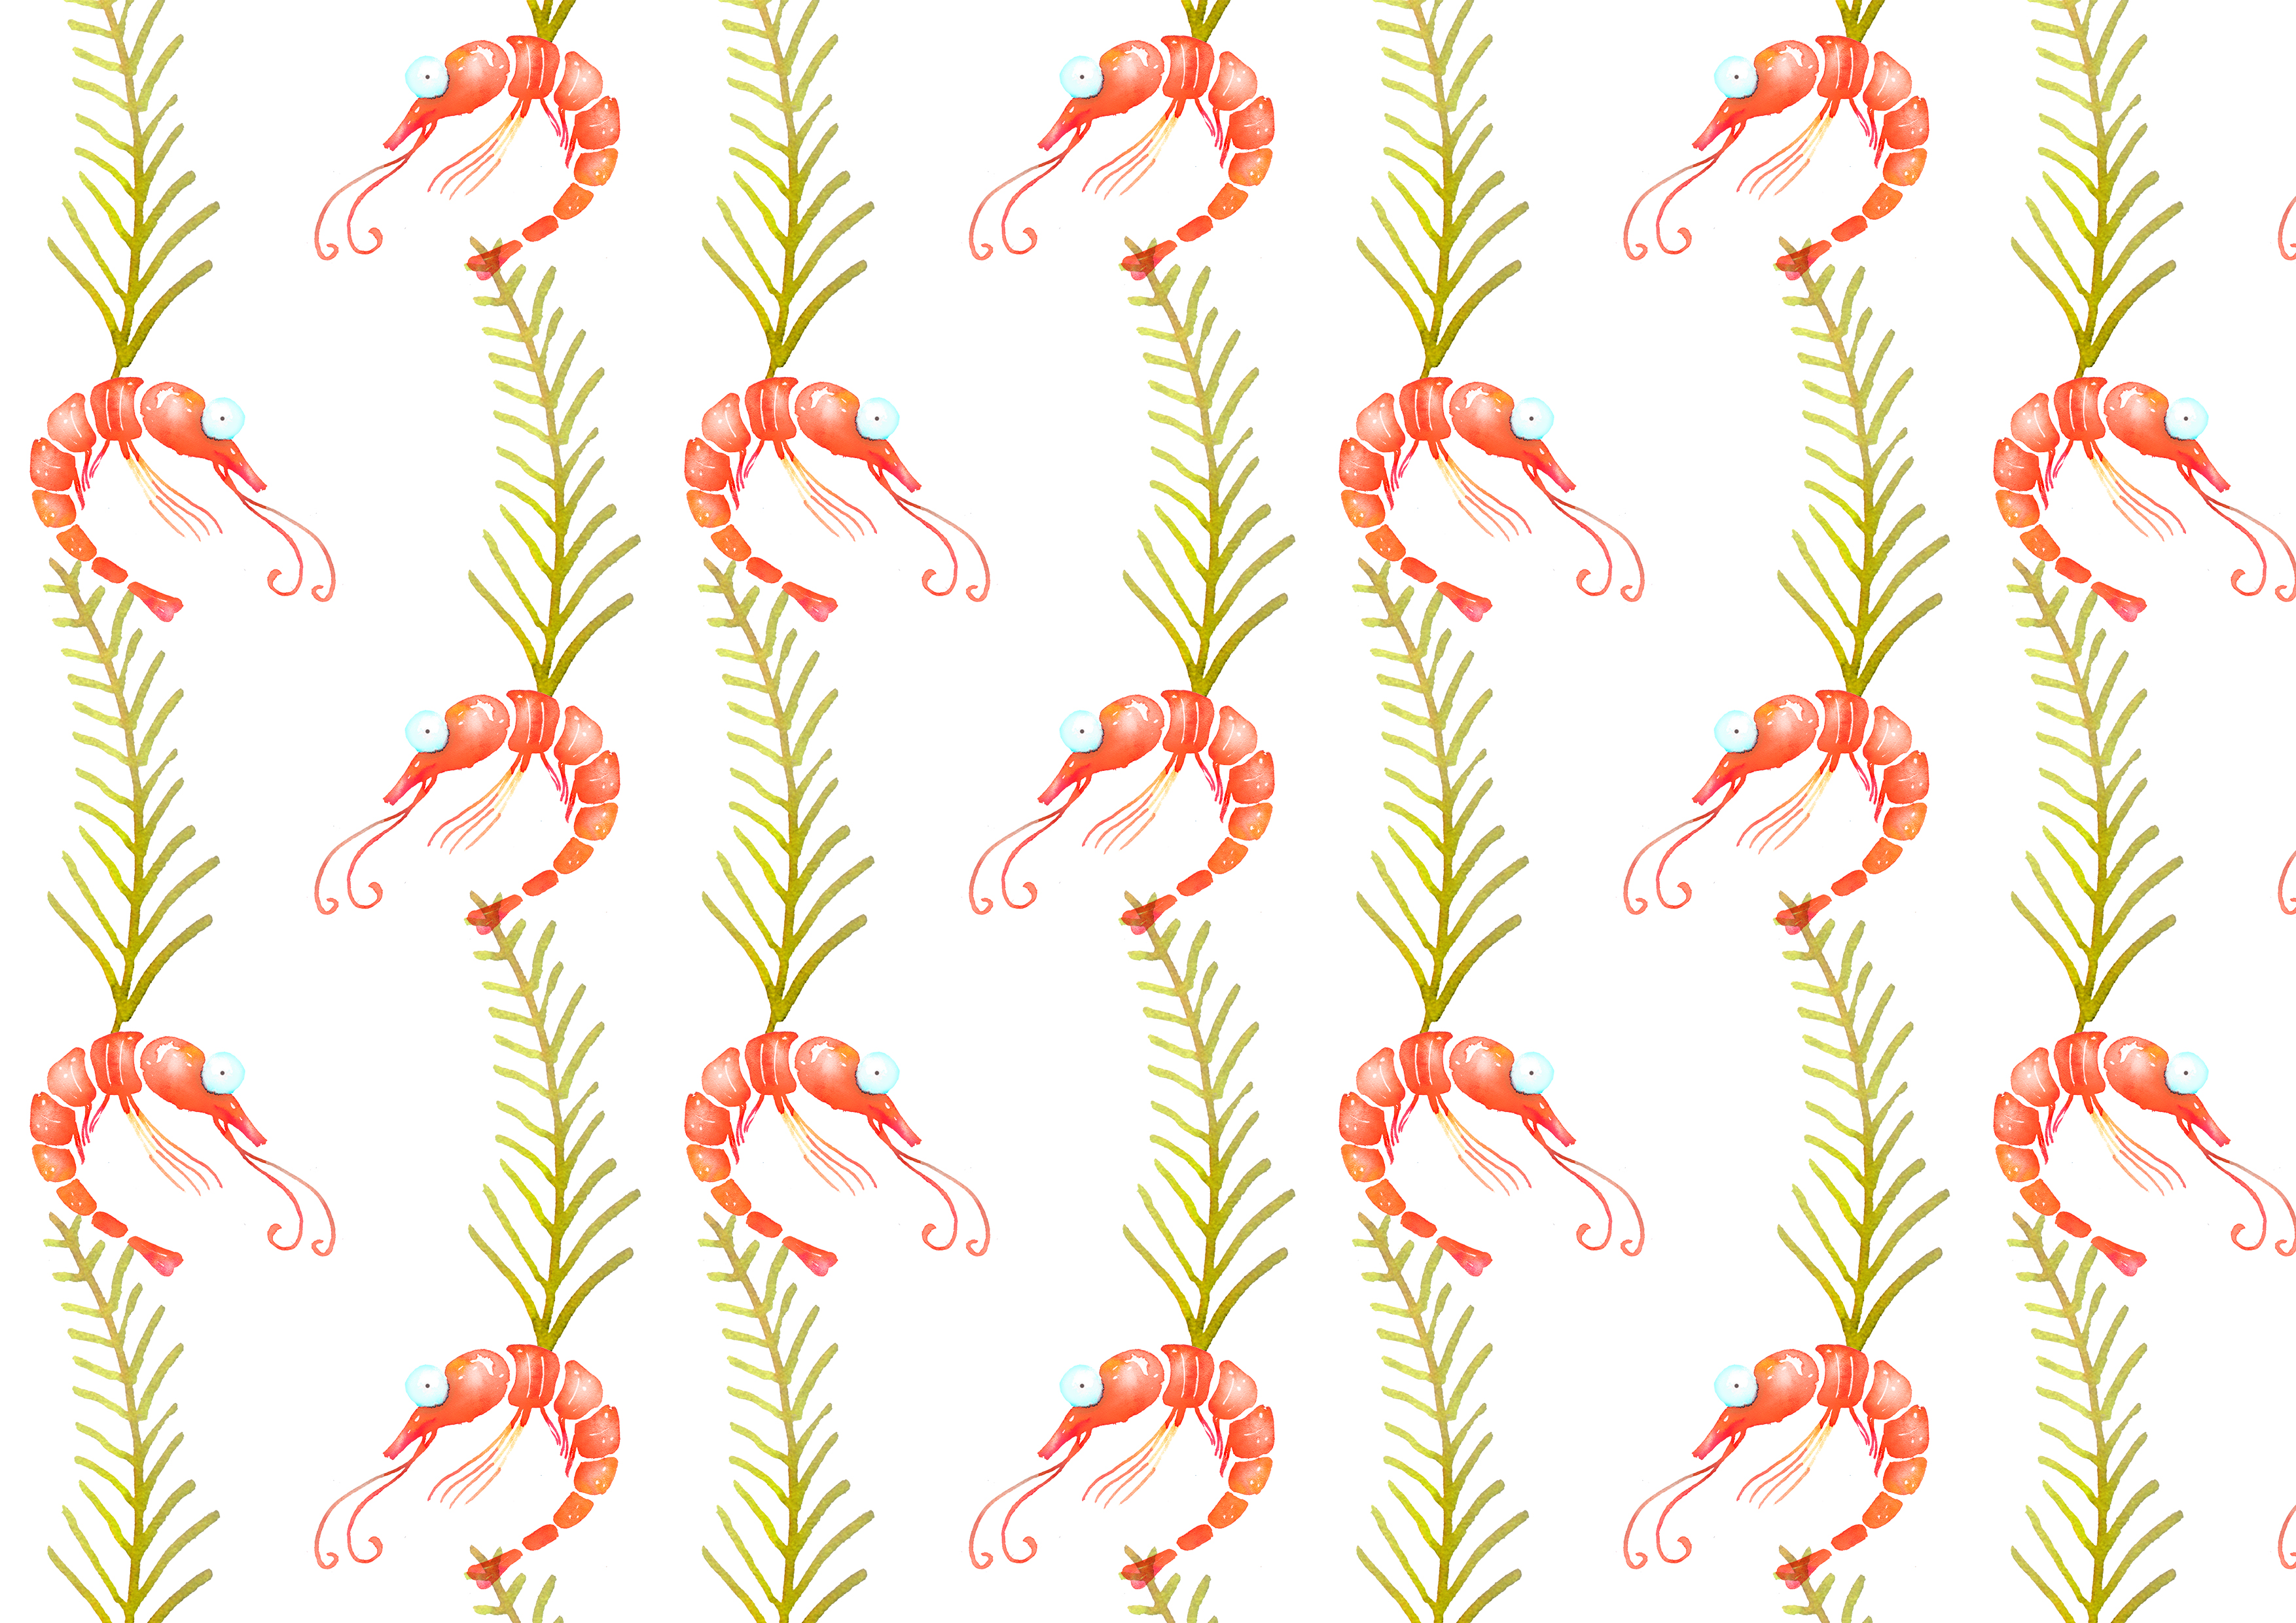 Shrimps watercolor patterns set example image 5